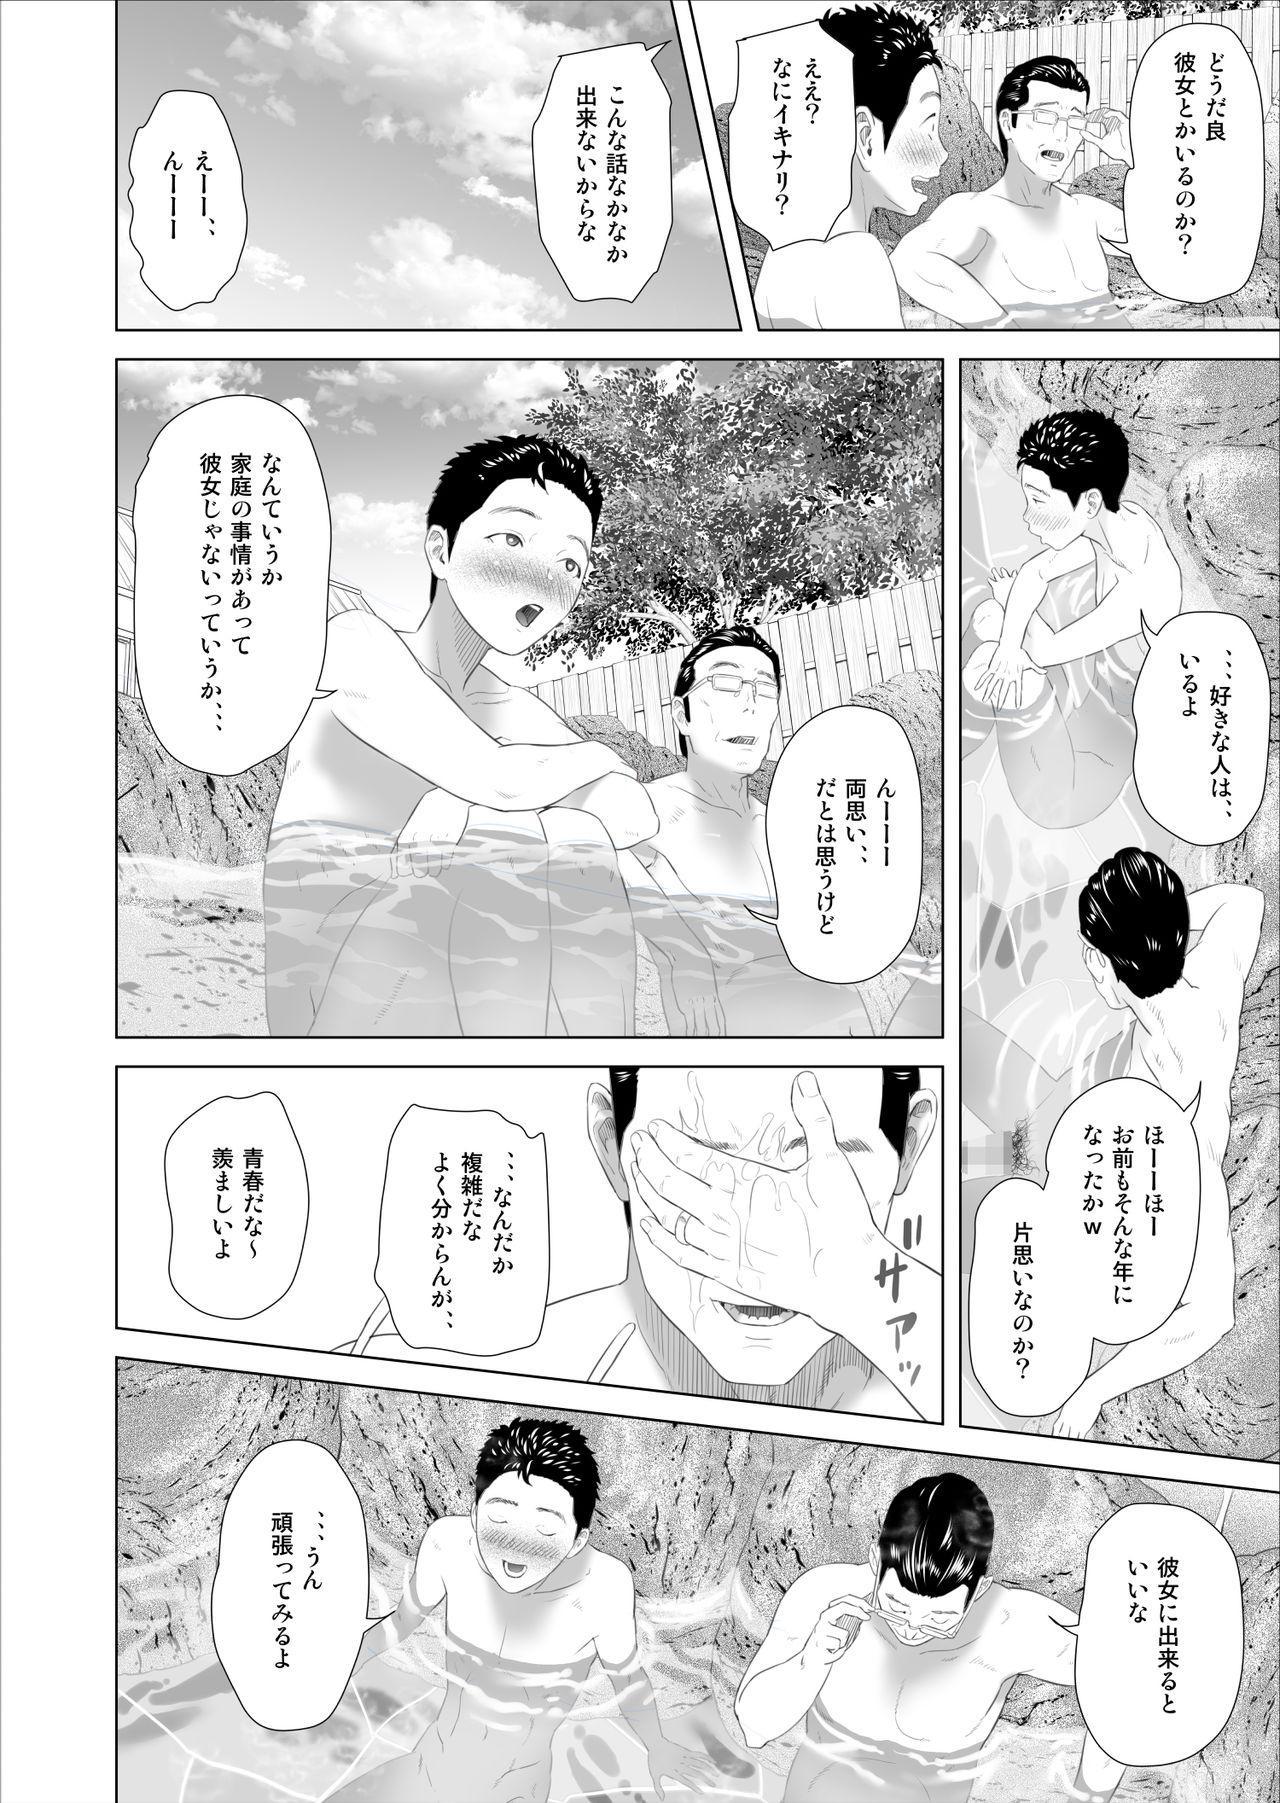 Kinjo Yuuwaku Musuko o Yobai ni Sasou Haha Hen | Neighborhood Seduction Mother Lures Son for a Night Visit! 219